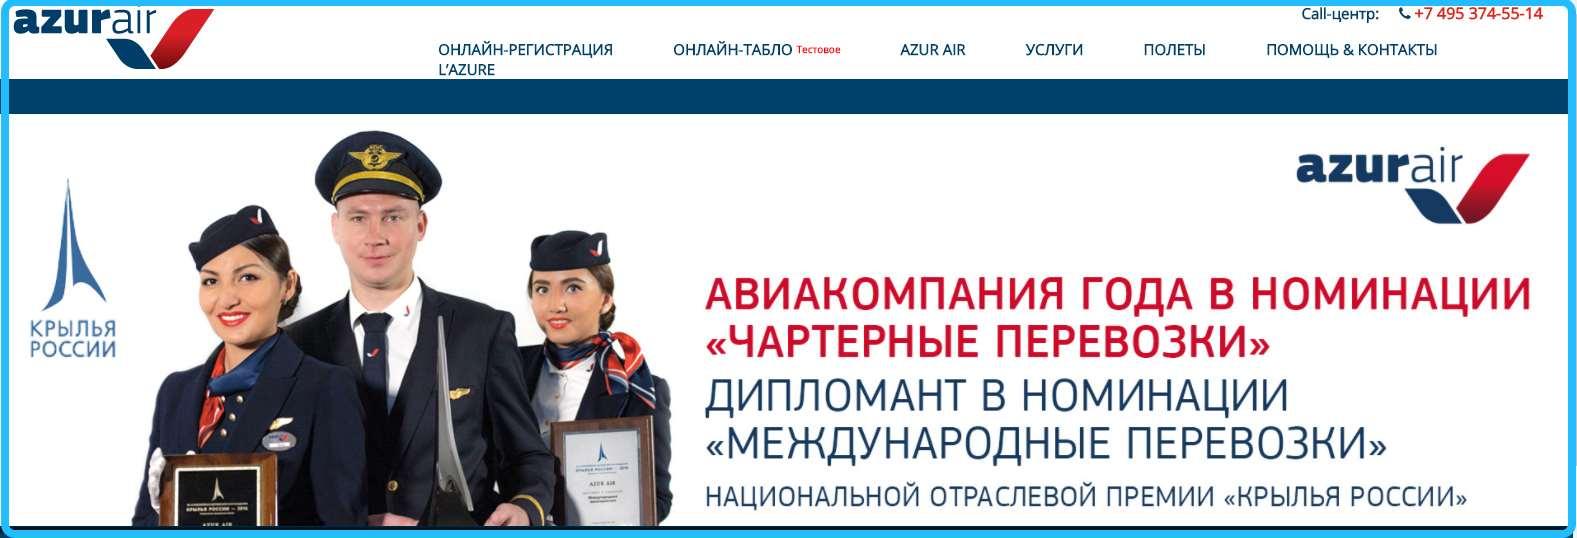 официальный сайт АЗУР эйр